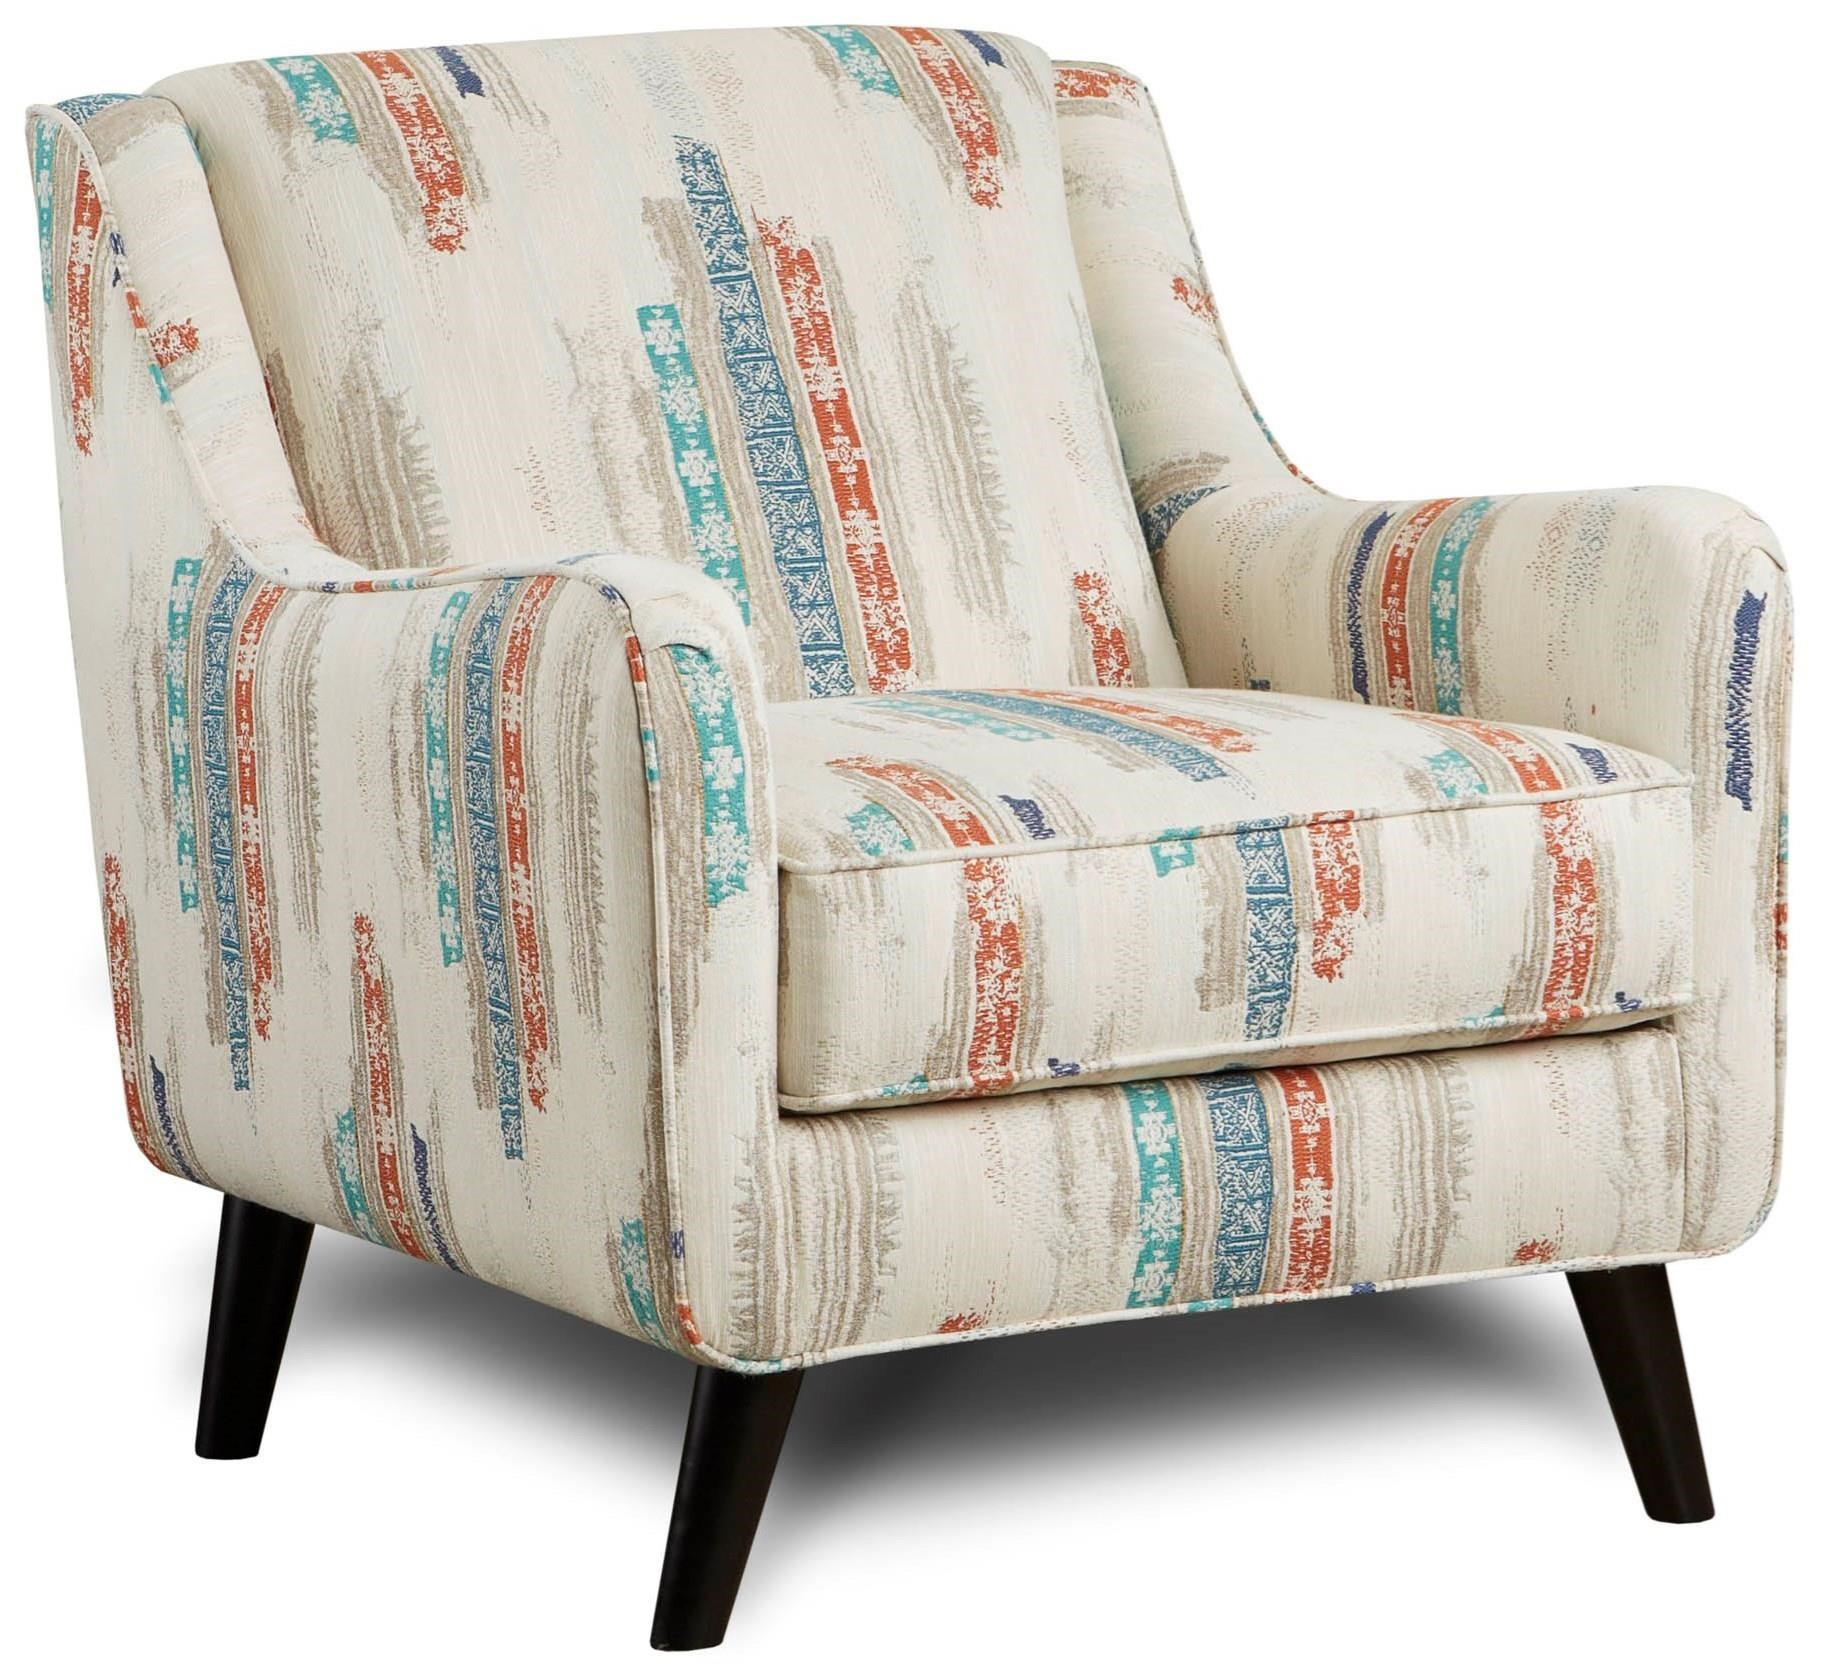 VFM Signature 240 Chair - Item Number: 240Mexicali Southwest